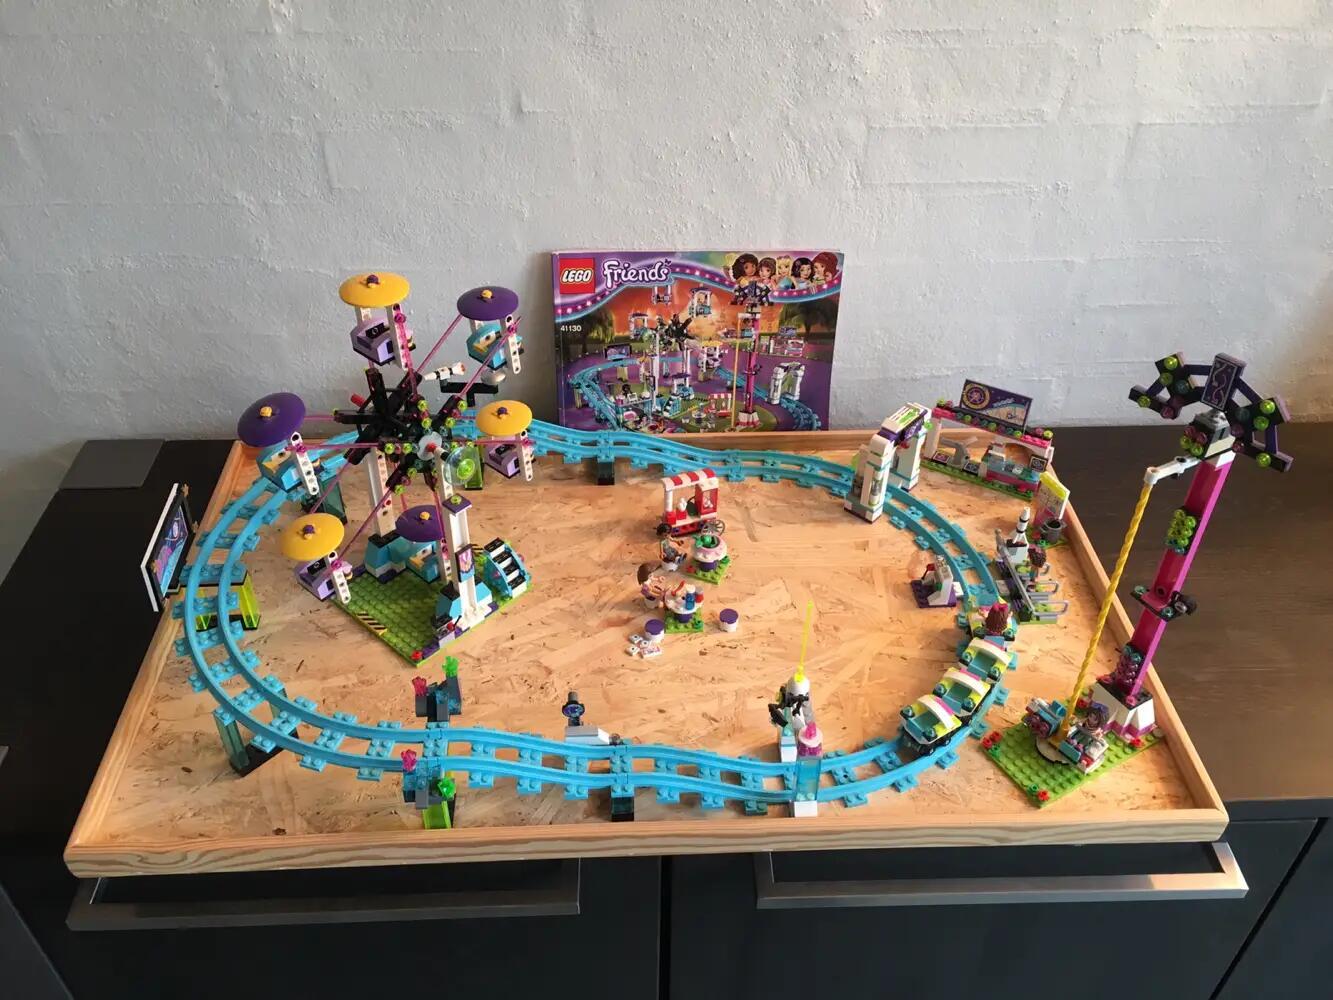 Lego Friends forlystelsespark .